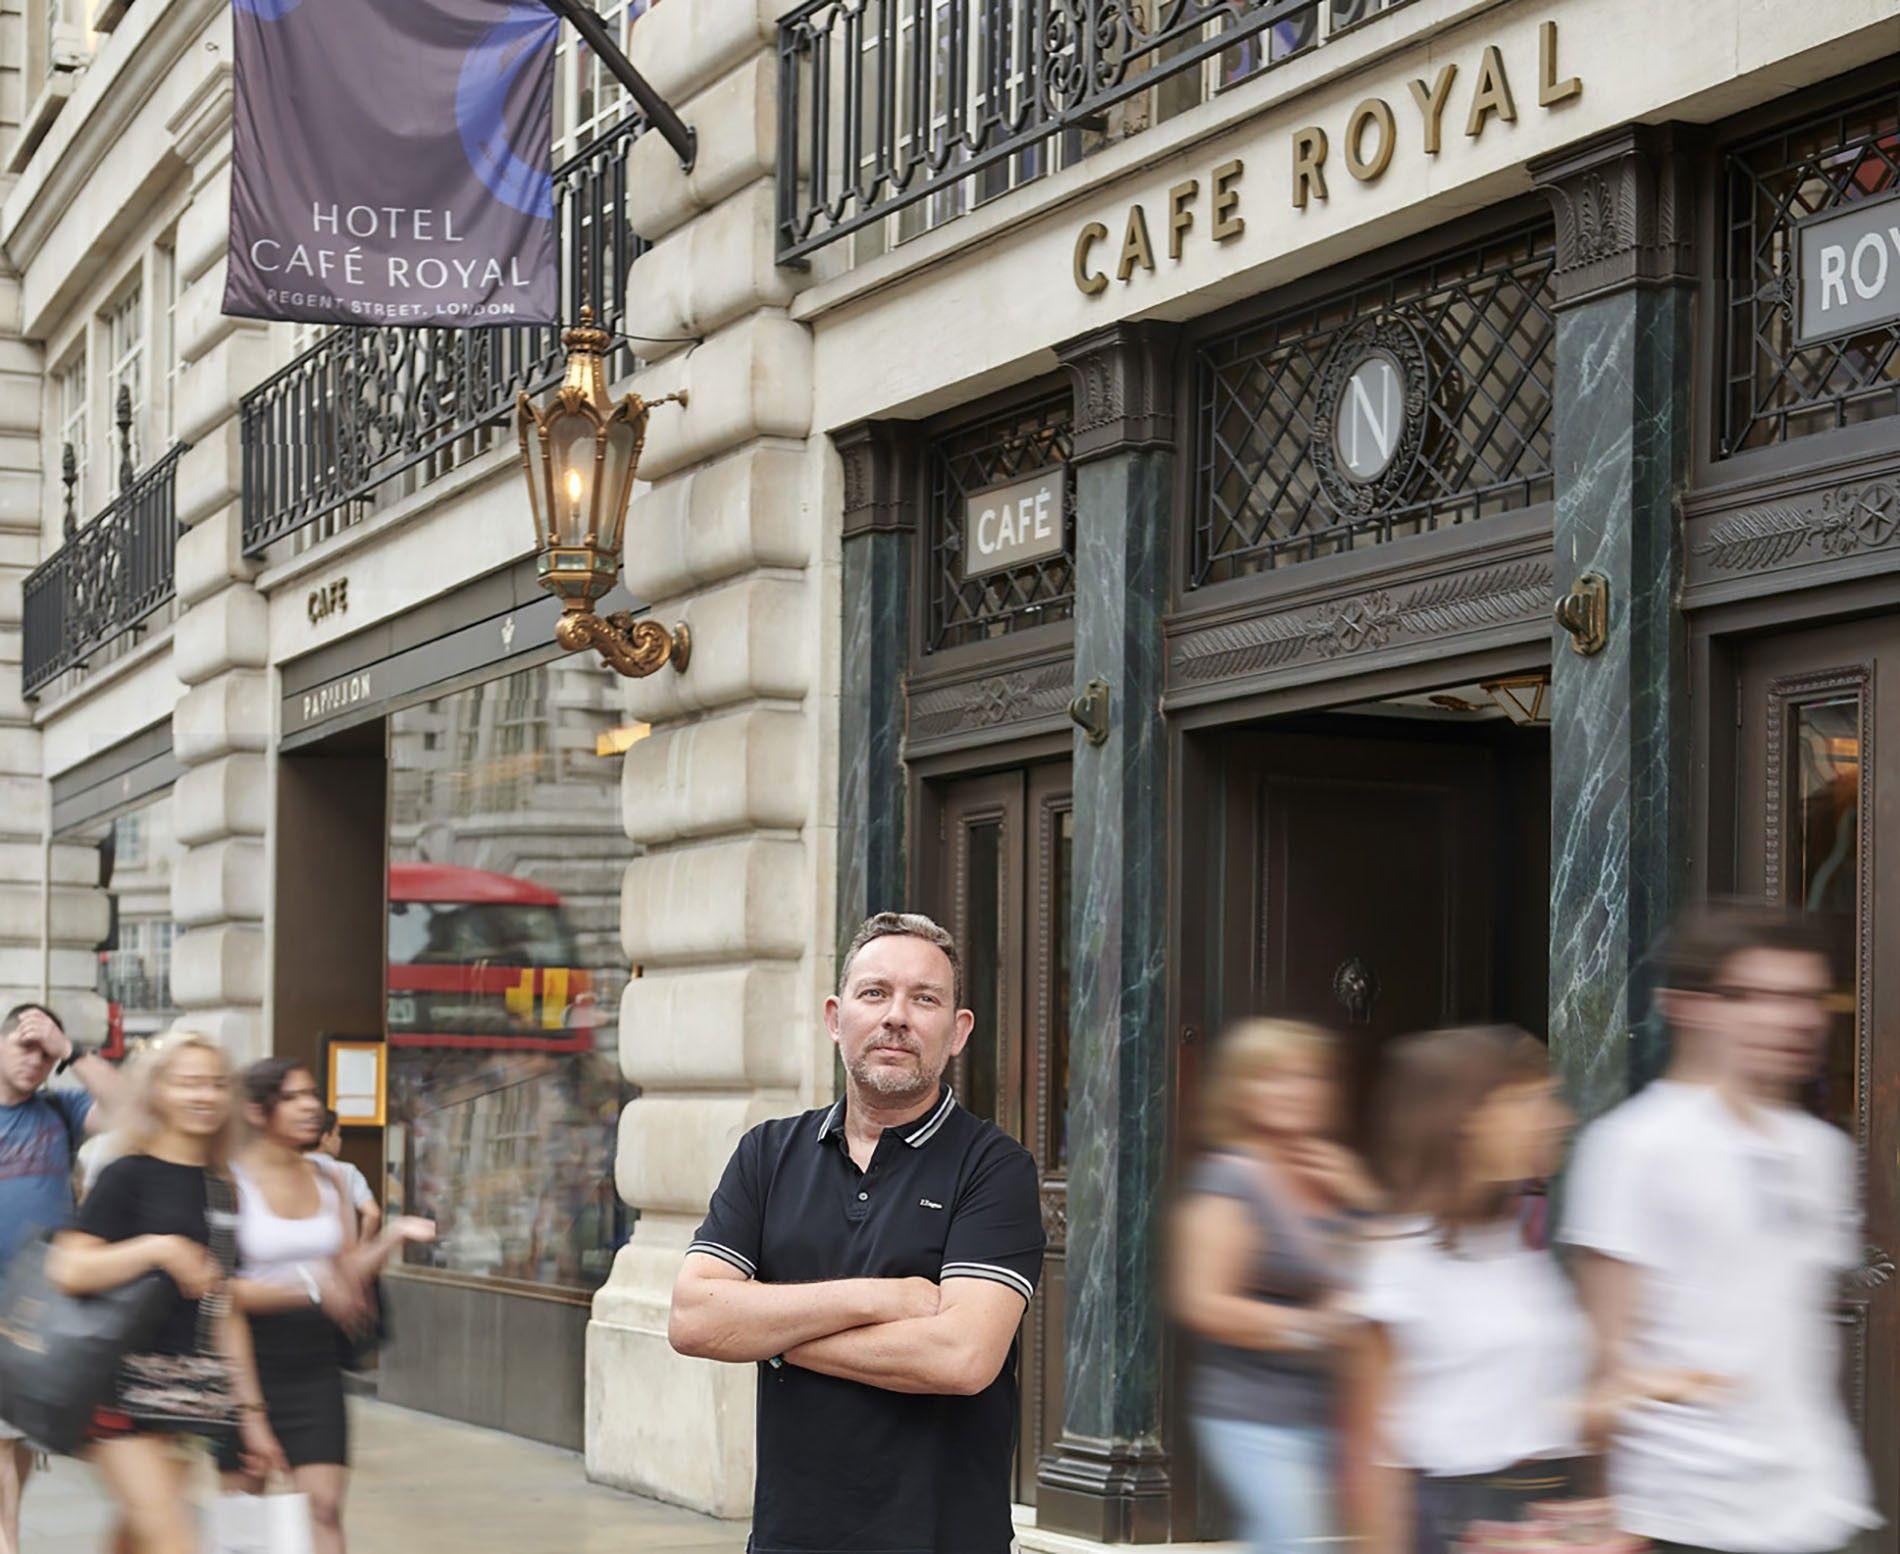 Albert Adrià outside Hotel Café Royal